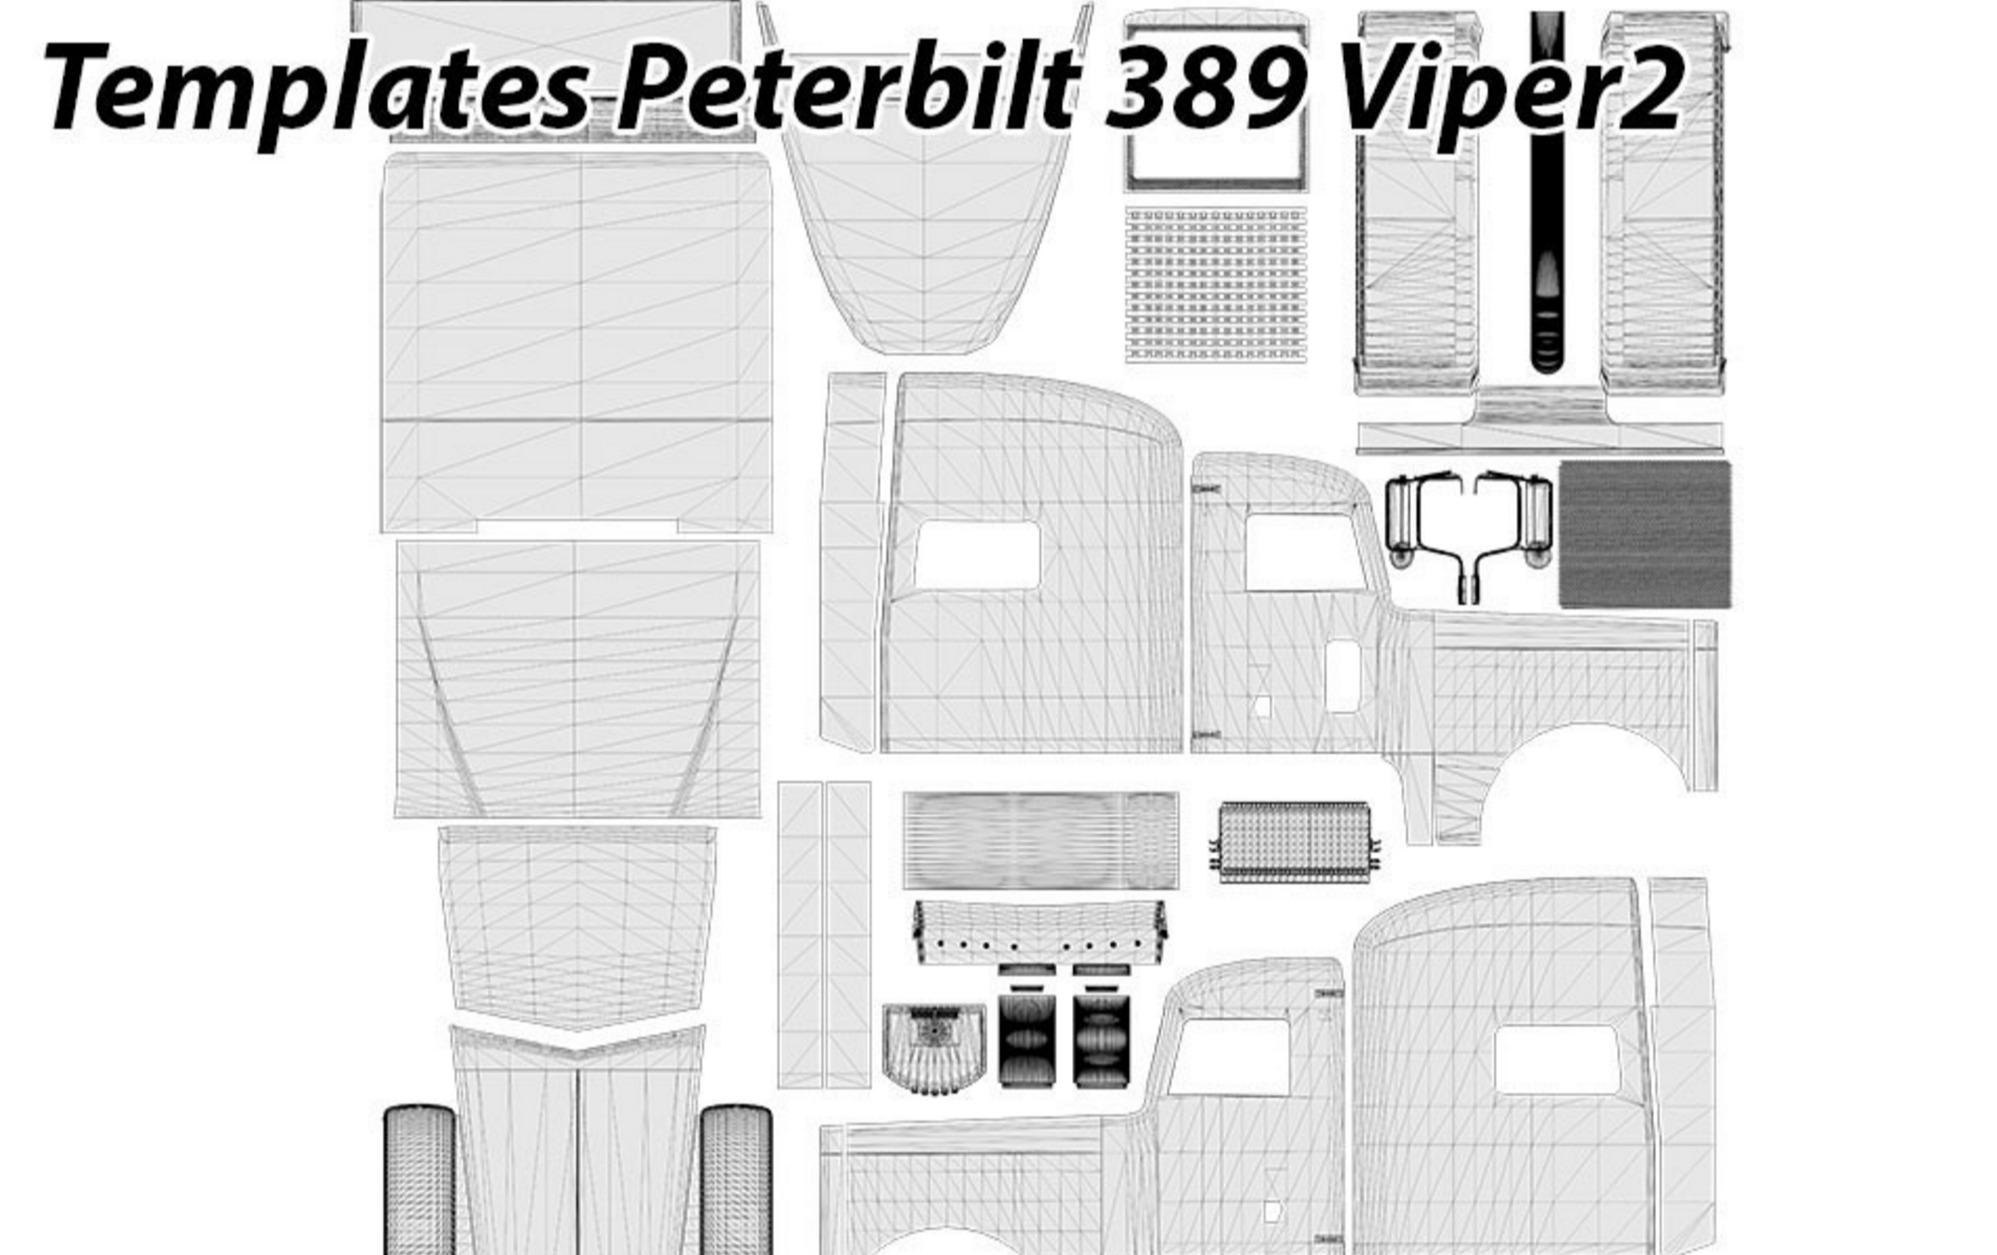 Peterbilt 389 viper2 templates american truck simulator for Howell s motor freight